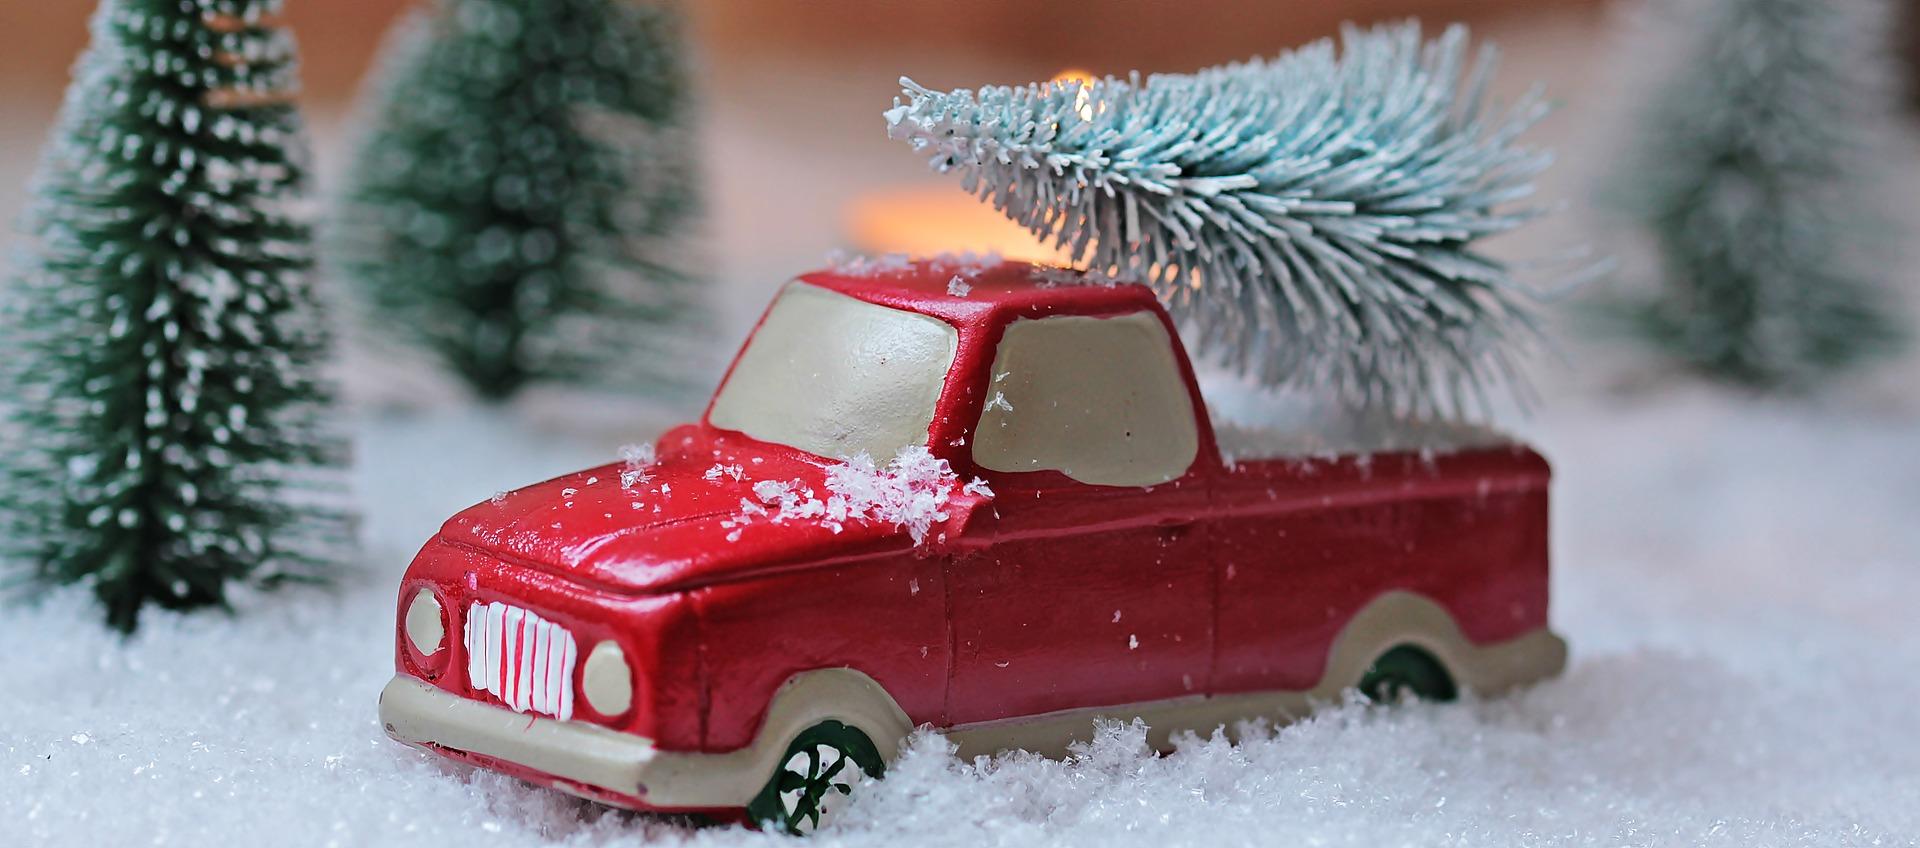 20161221_weihnachtsgruesse-auto